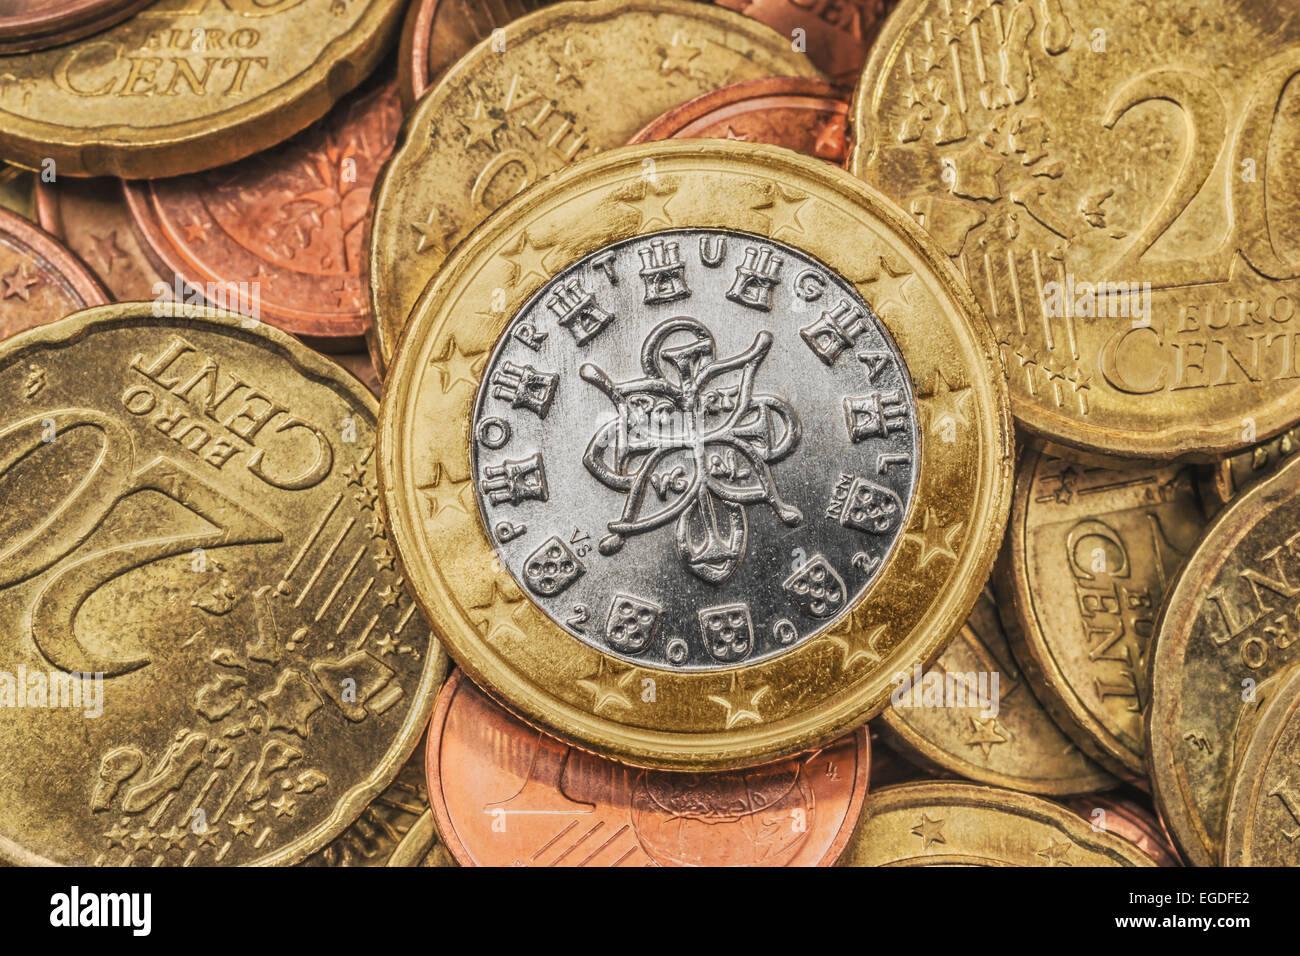 Coin Euro Portugal Photos Coin Euro Portugal Images Alamy